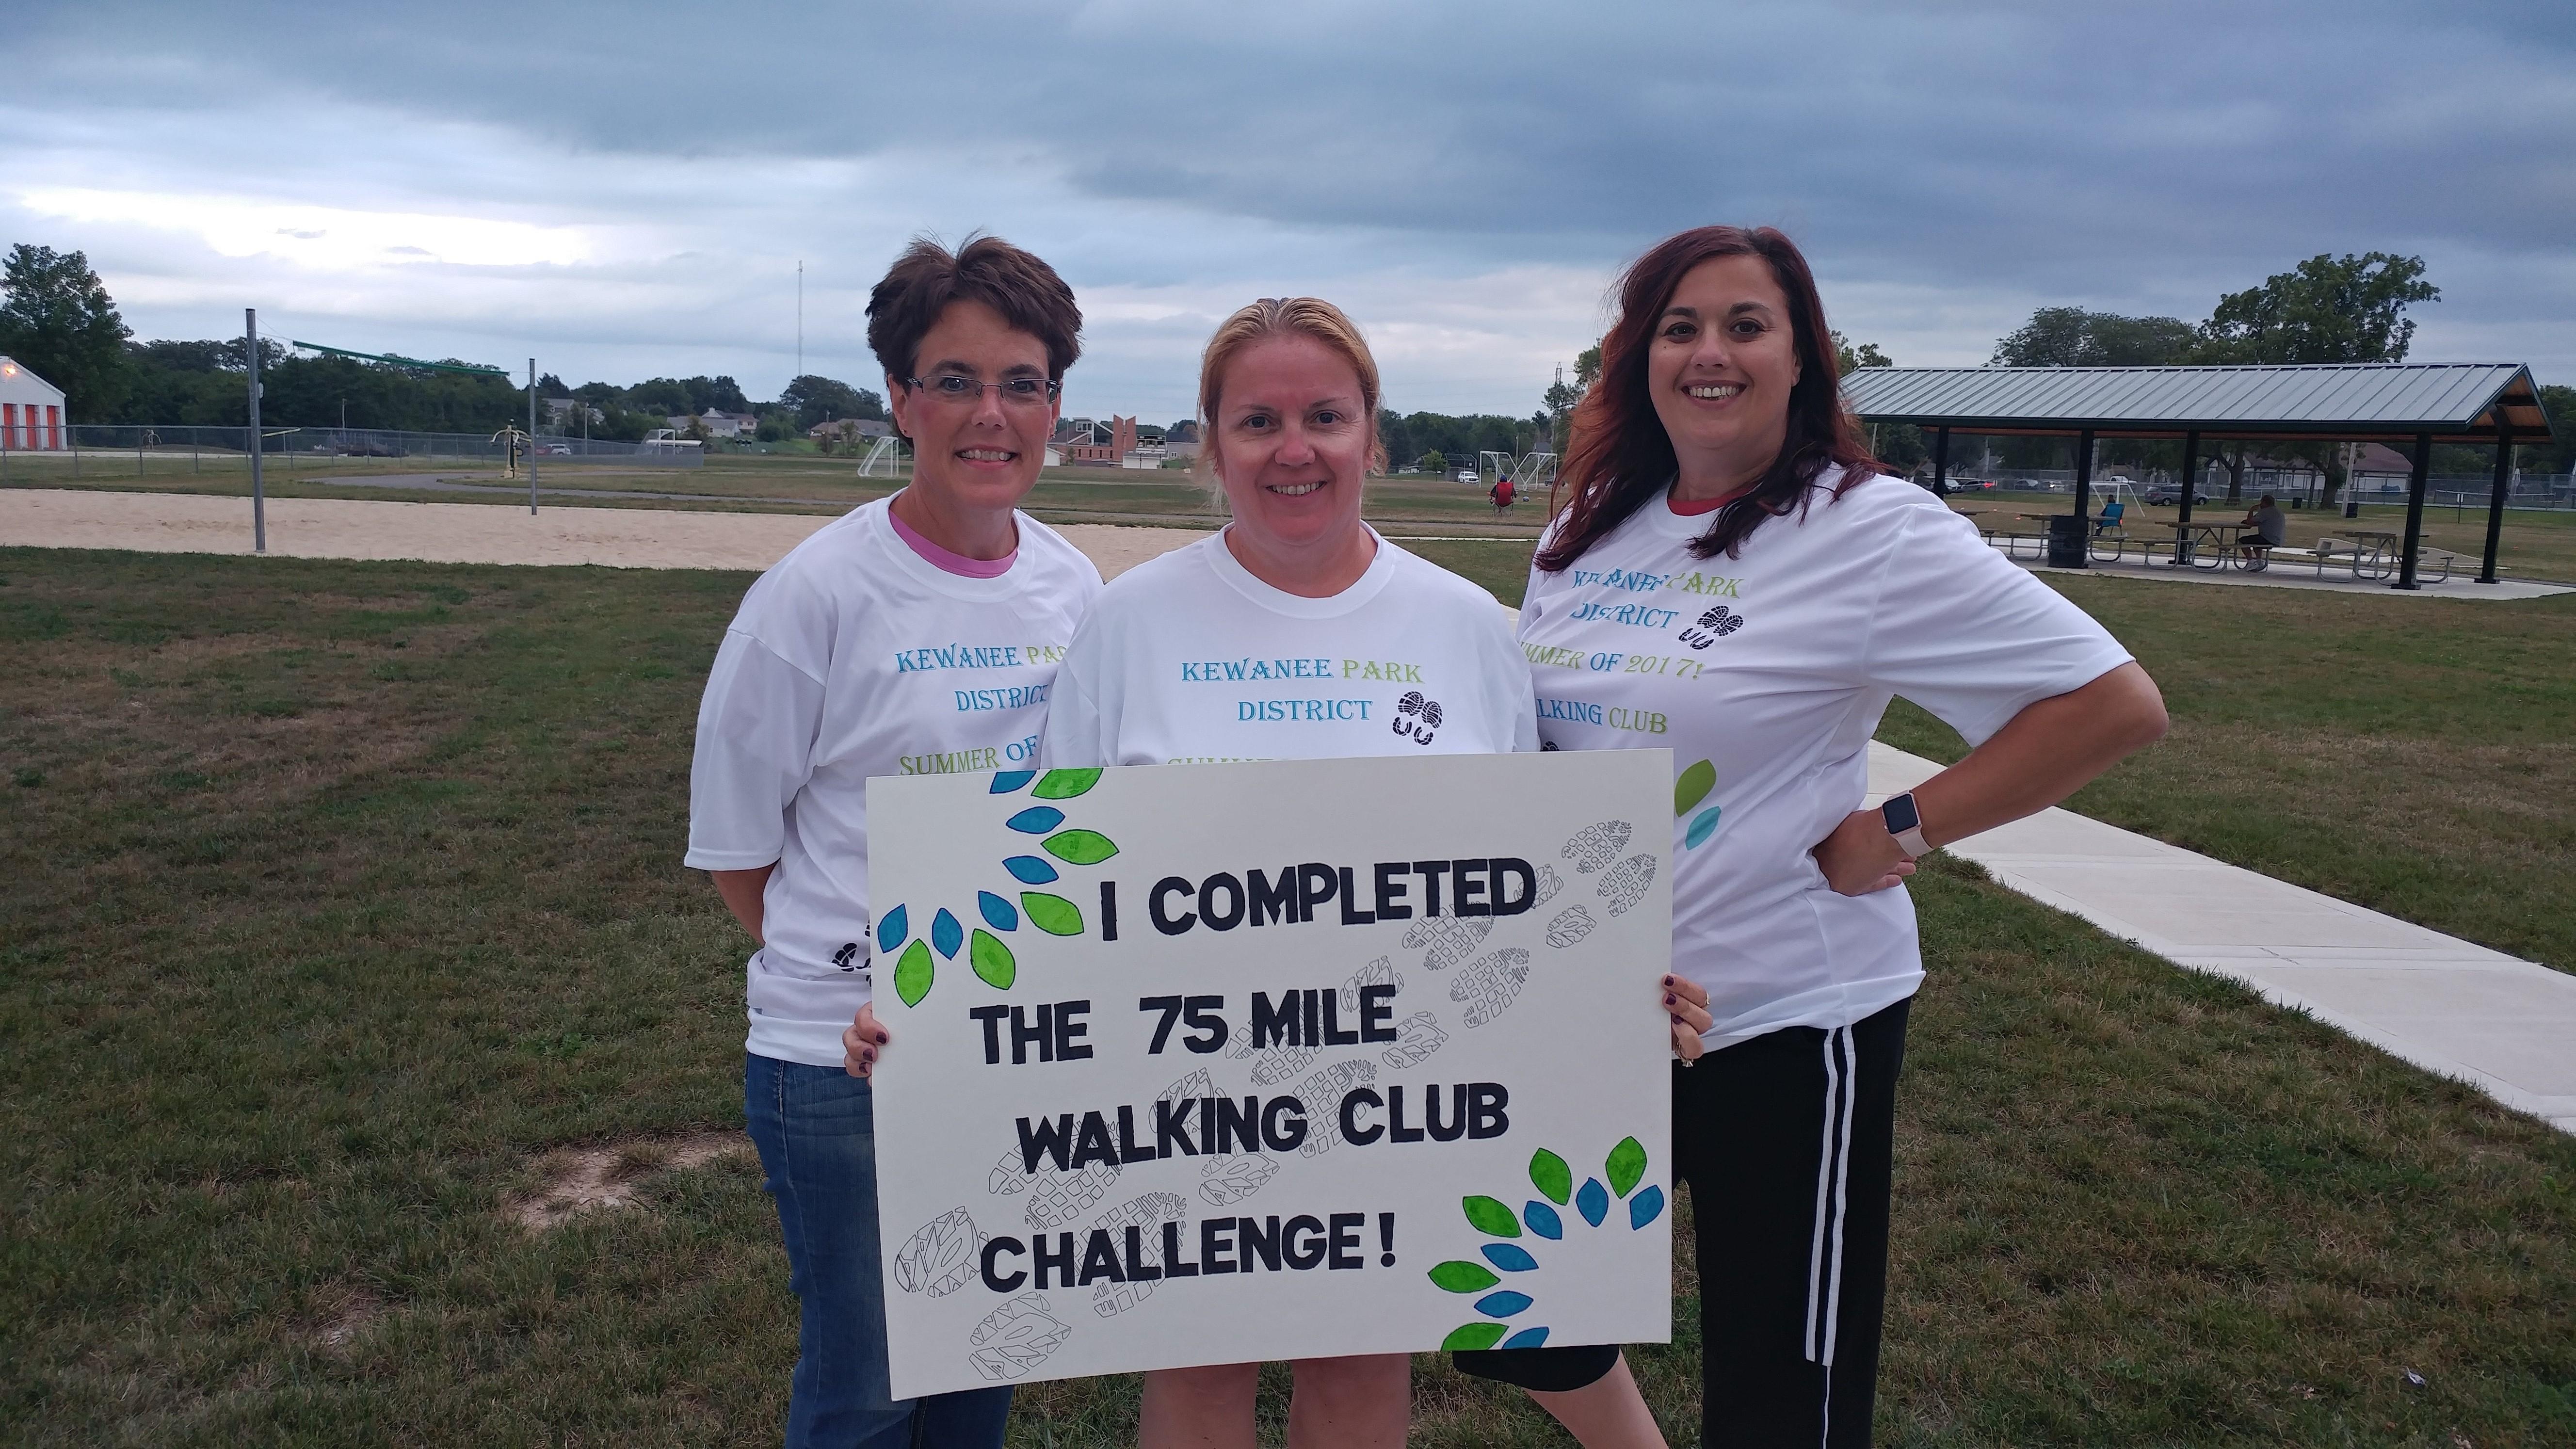 Walking Club Kewanee Park District